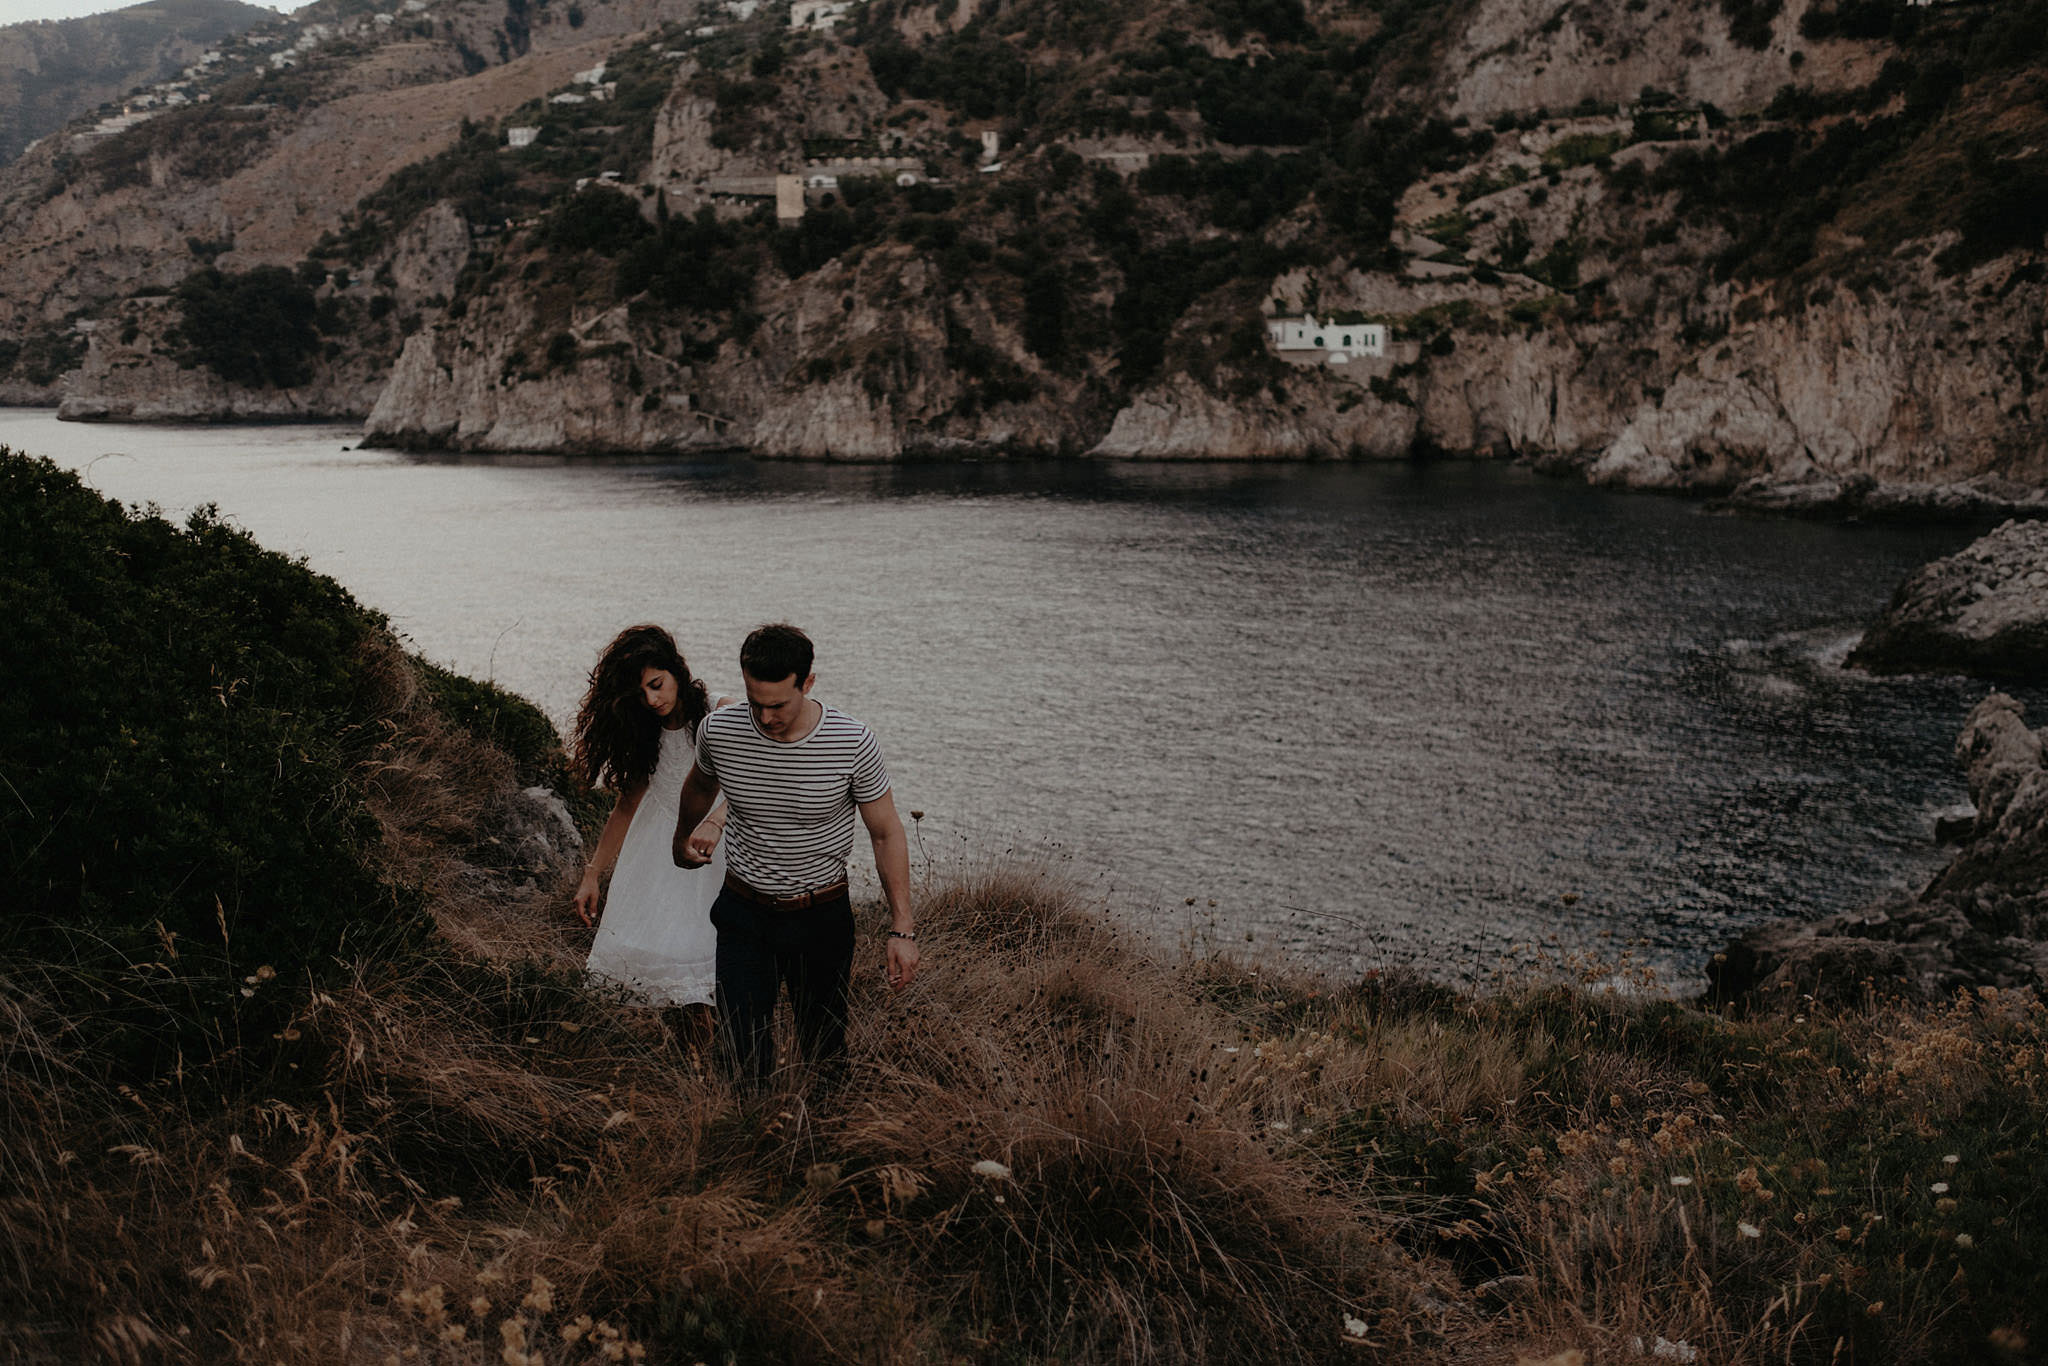 Max-Steph-Italy-Wedding-944.jpg